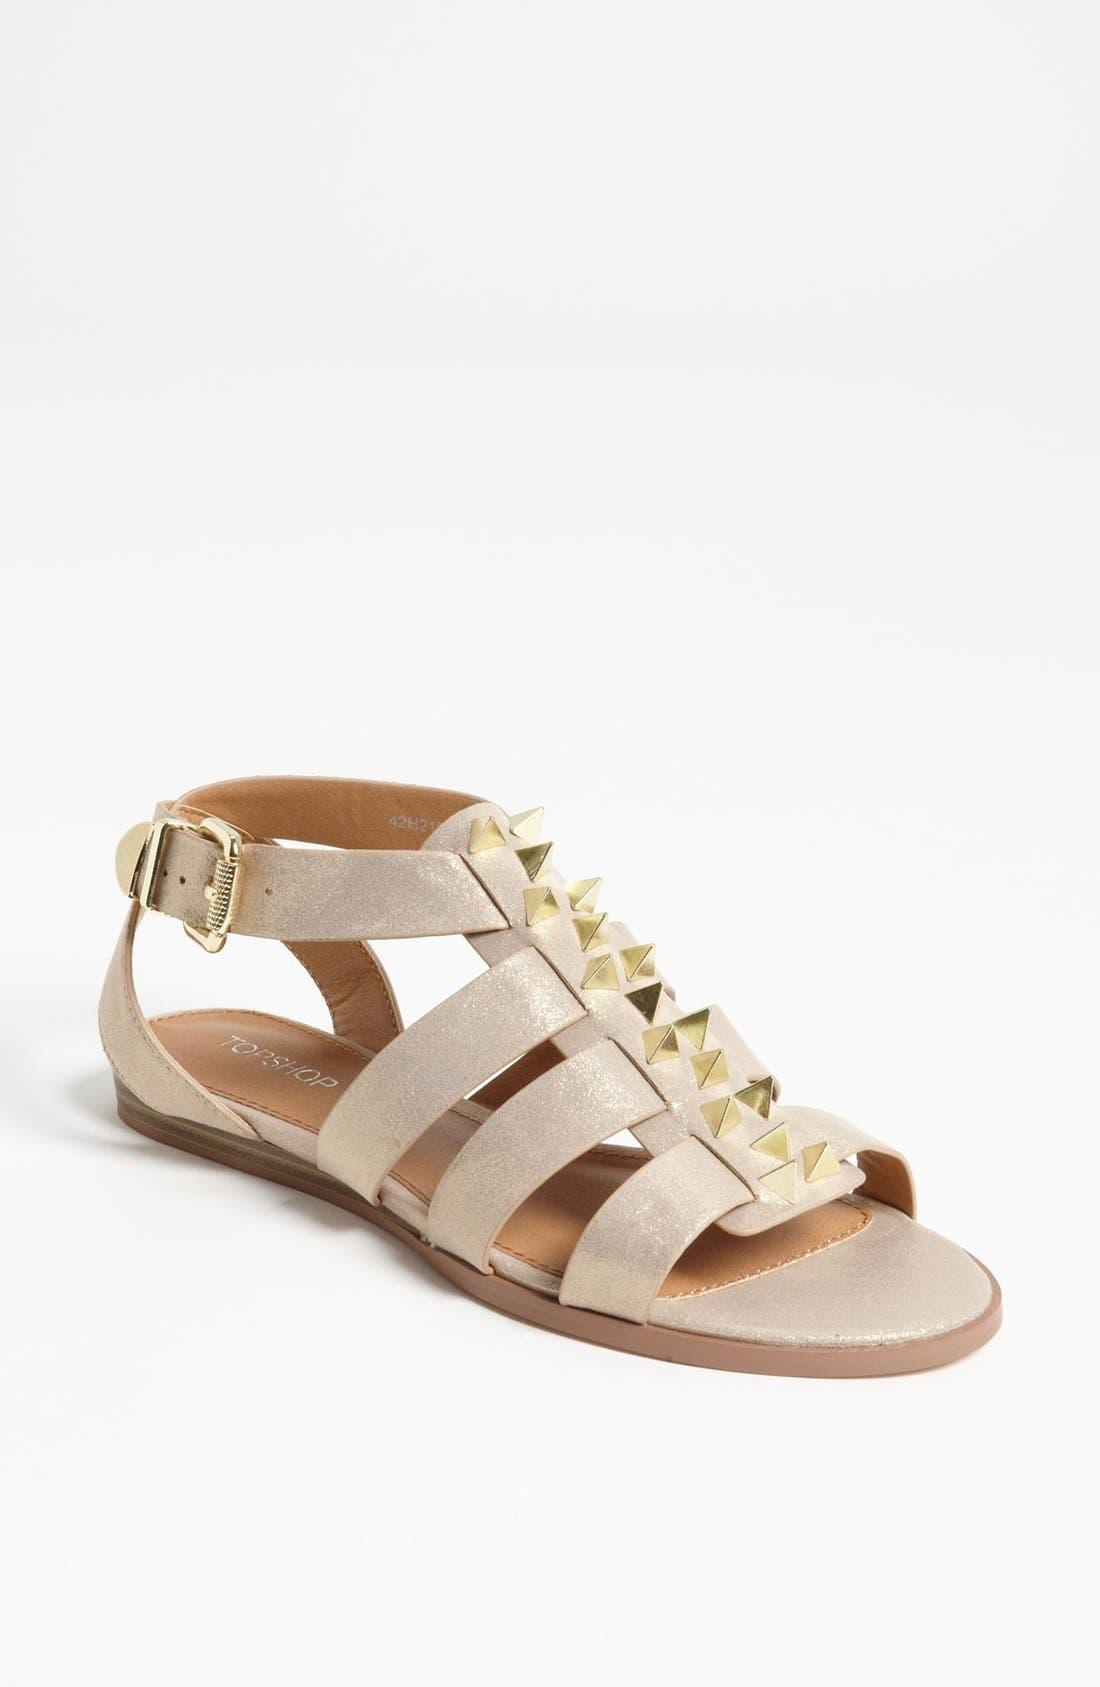 Main Image - Topshop 'Hope Stud' Gladiator Sandal